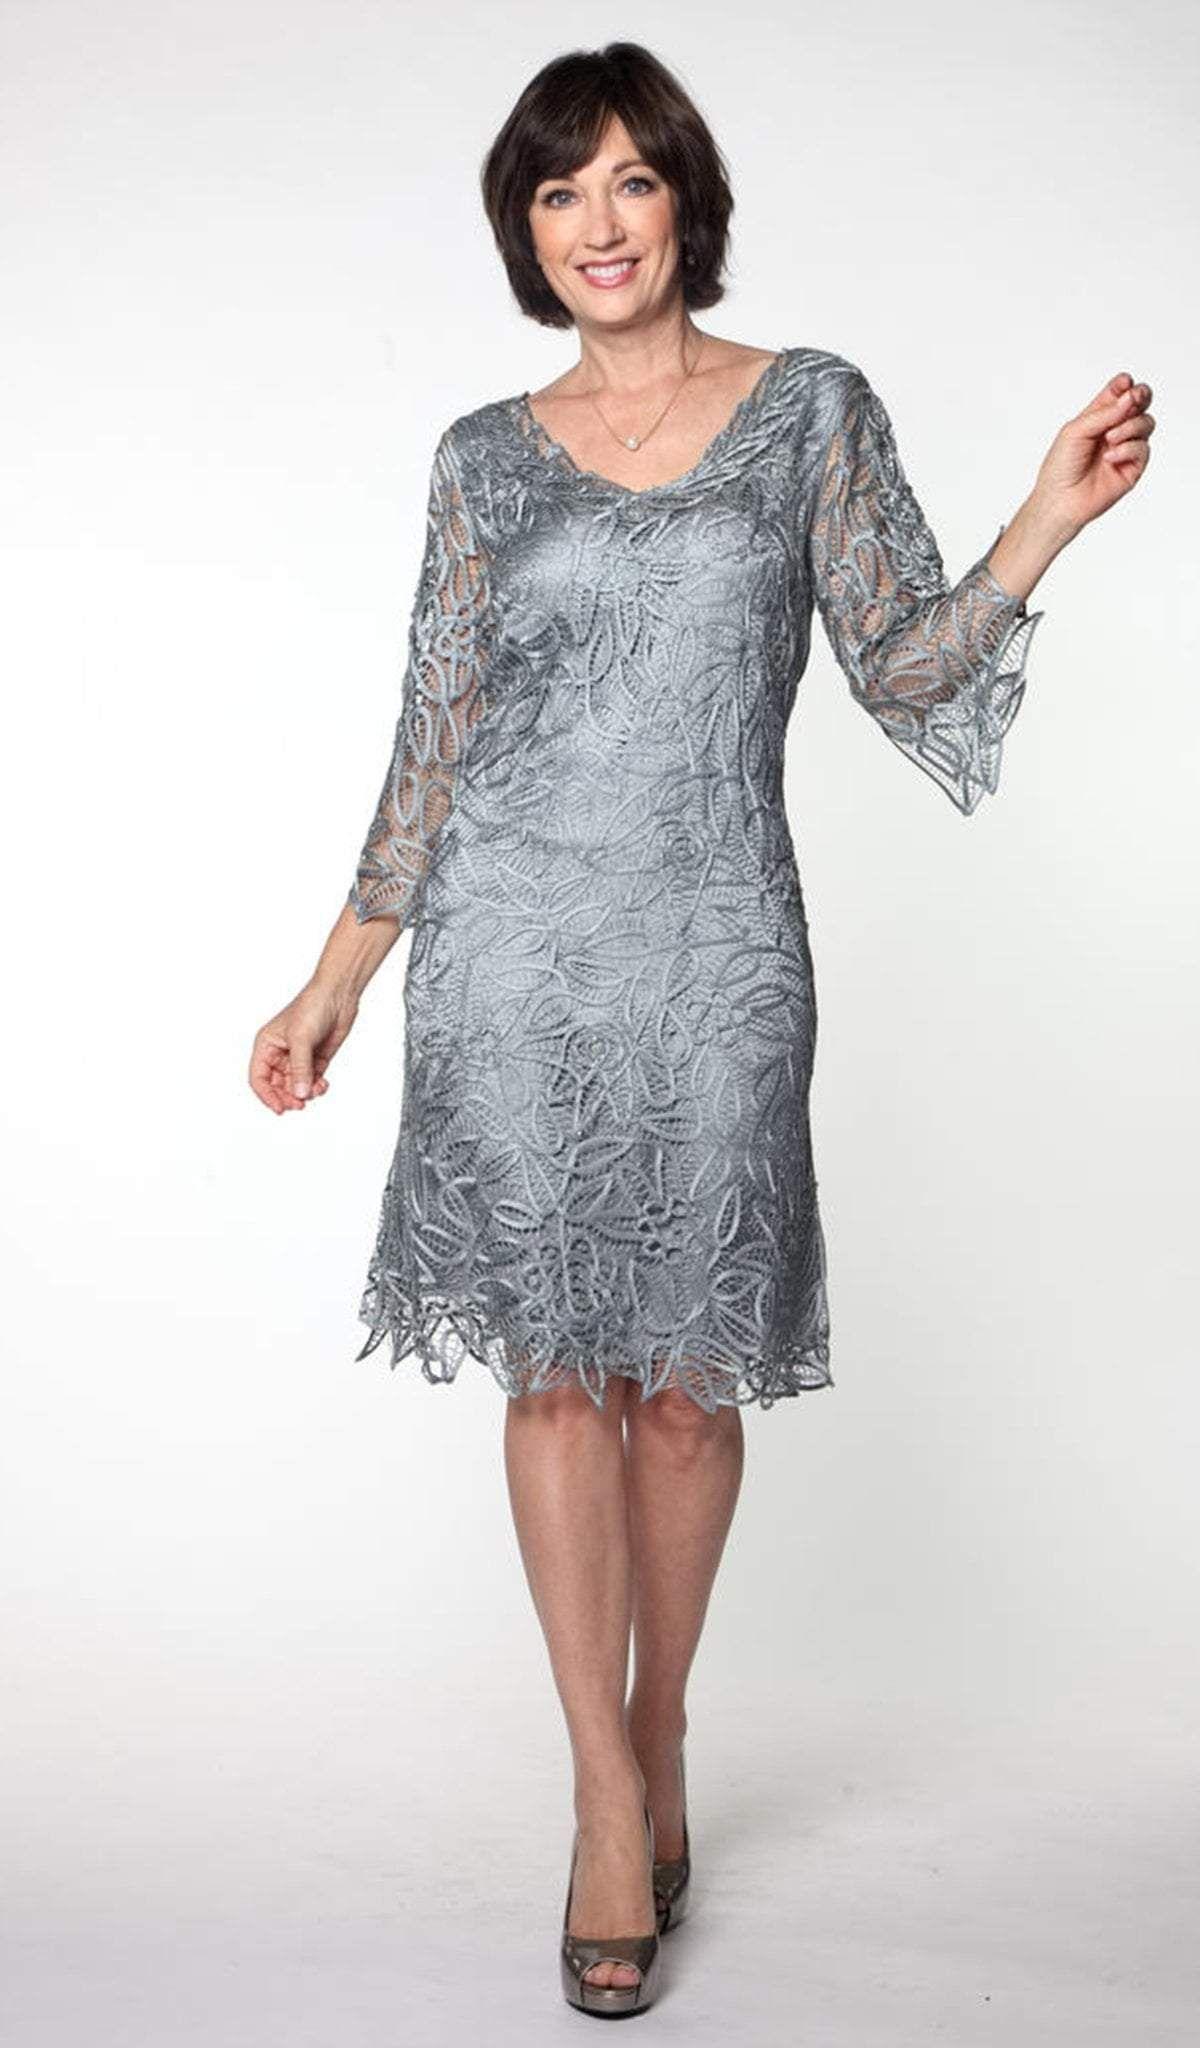 Soulmates C903 Crochet Lace VNeck 3/4 BellSleeve Dress